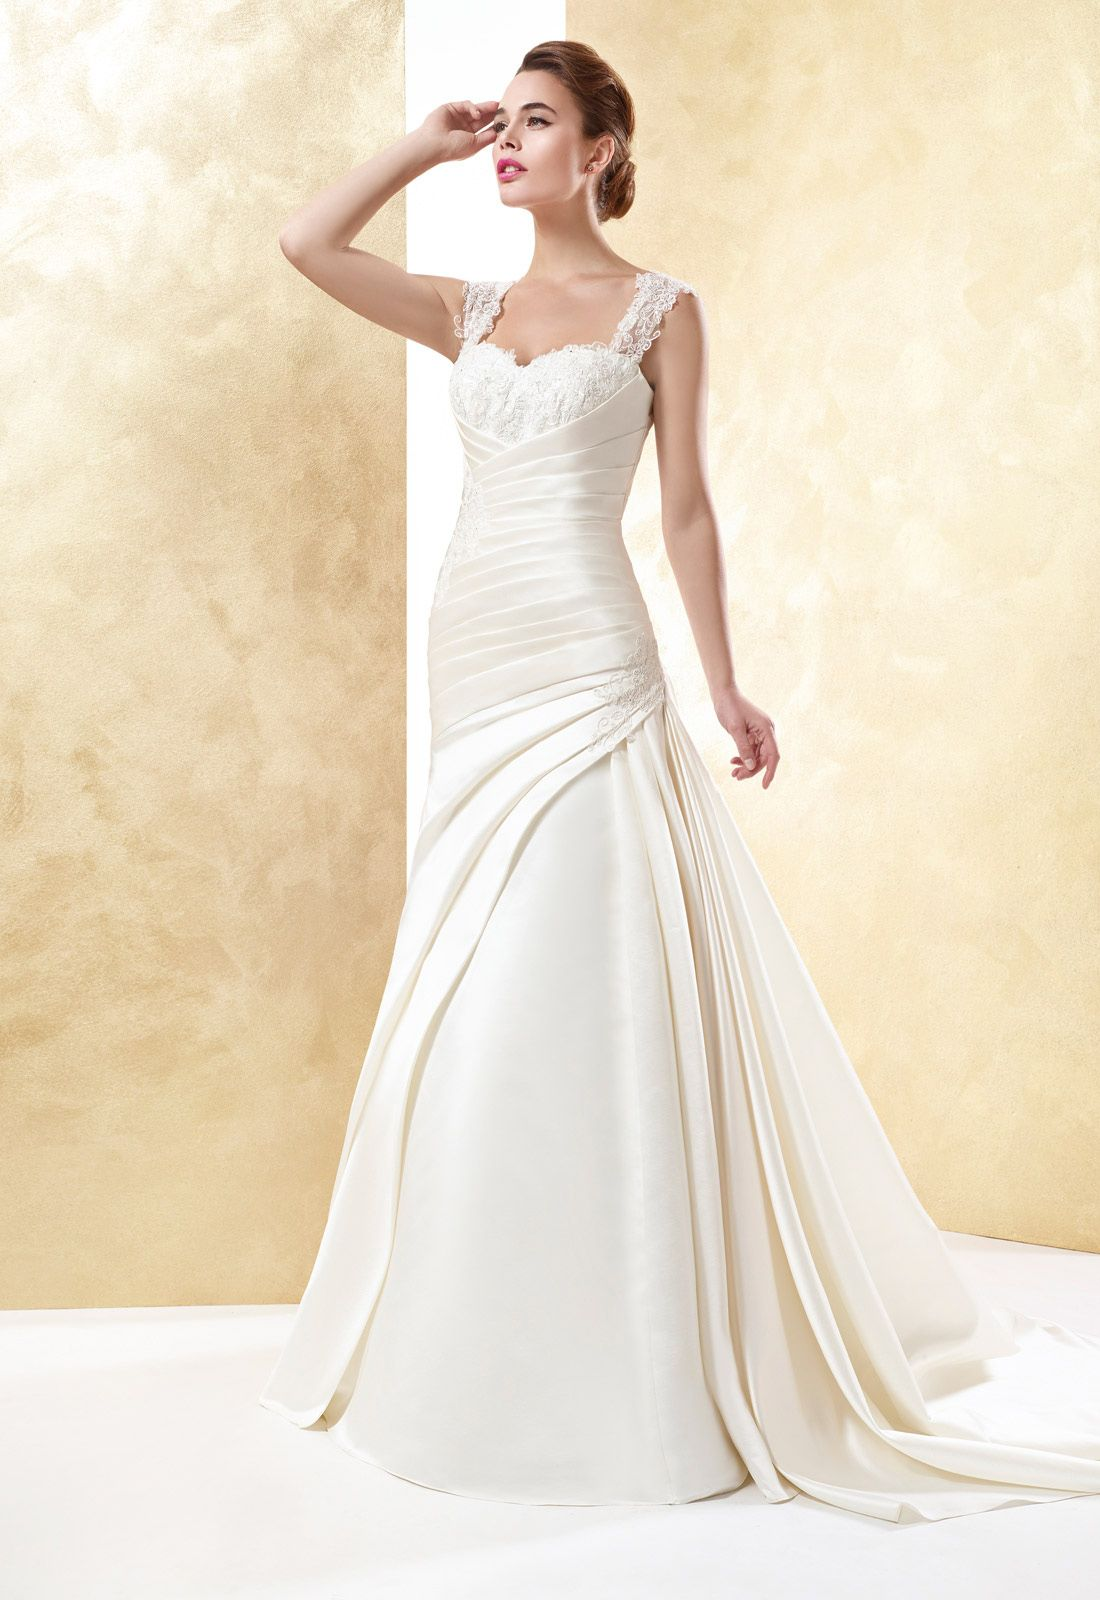 Lace wedding dress under 300  Simple Aline Straps Beading Lace Ruching SweepBrush Train Satin